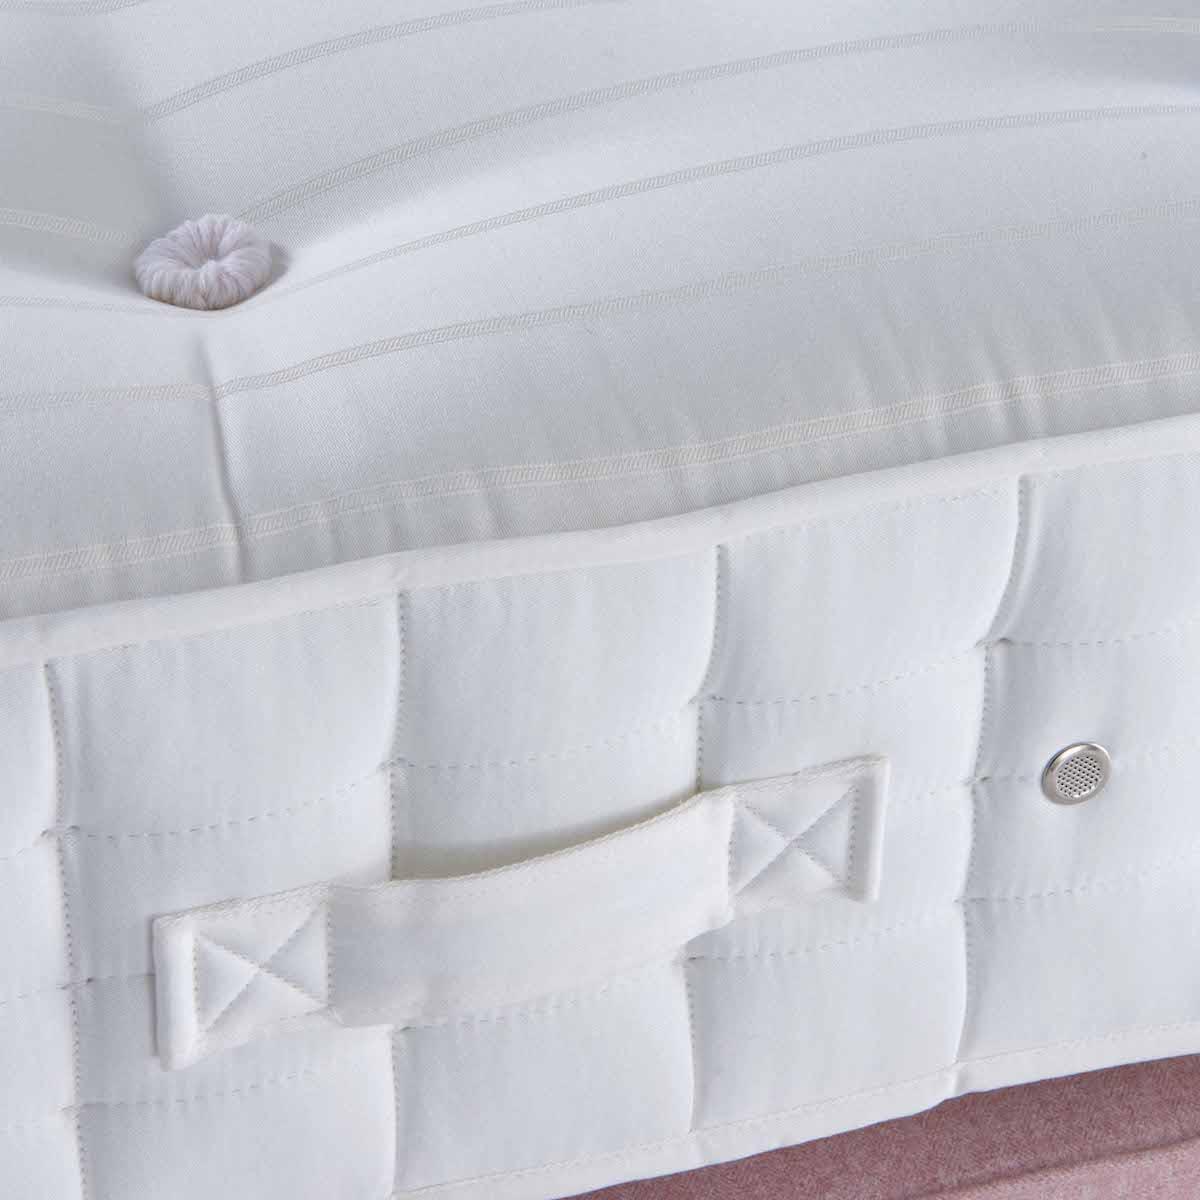 childrens plush chairs for sale craigslist hypnos orthos elite cashmere divan | best price promise